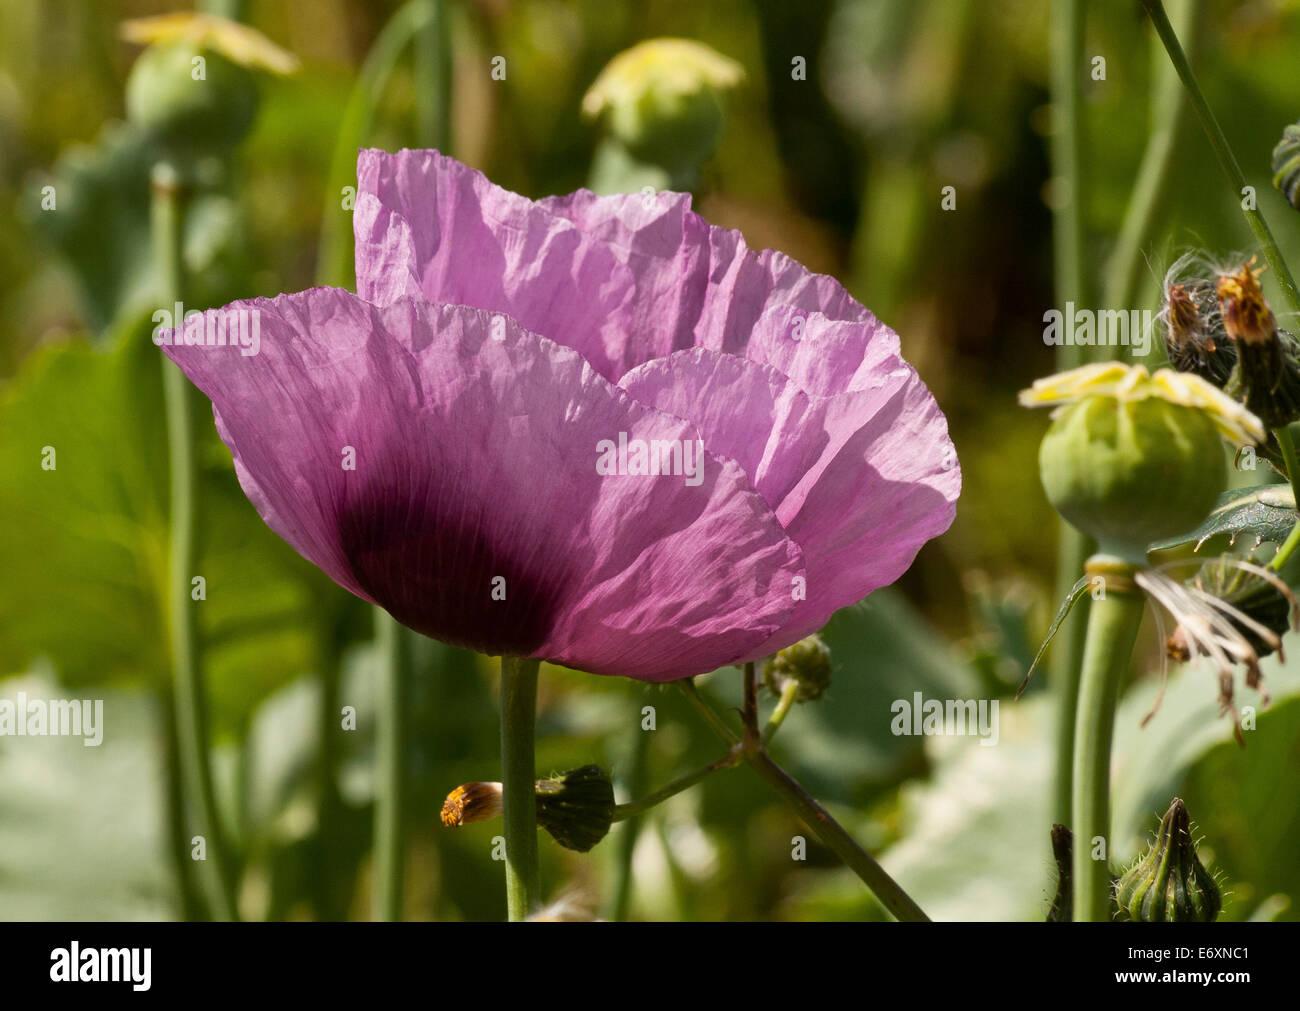 Purple poppy flowers and seed heads stock photos purple poppy lilac papaver somniferum opium poppy head and poppy seed heads stock image mightylinksfo